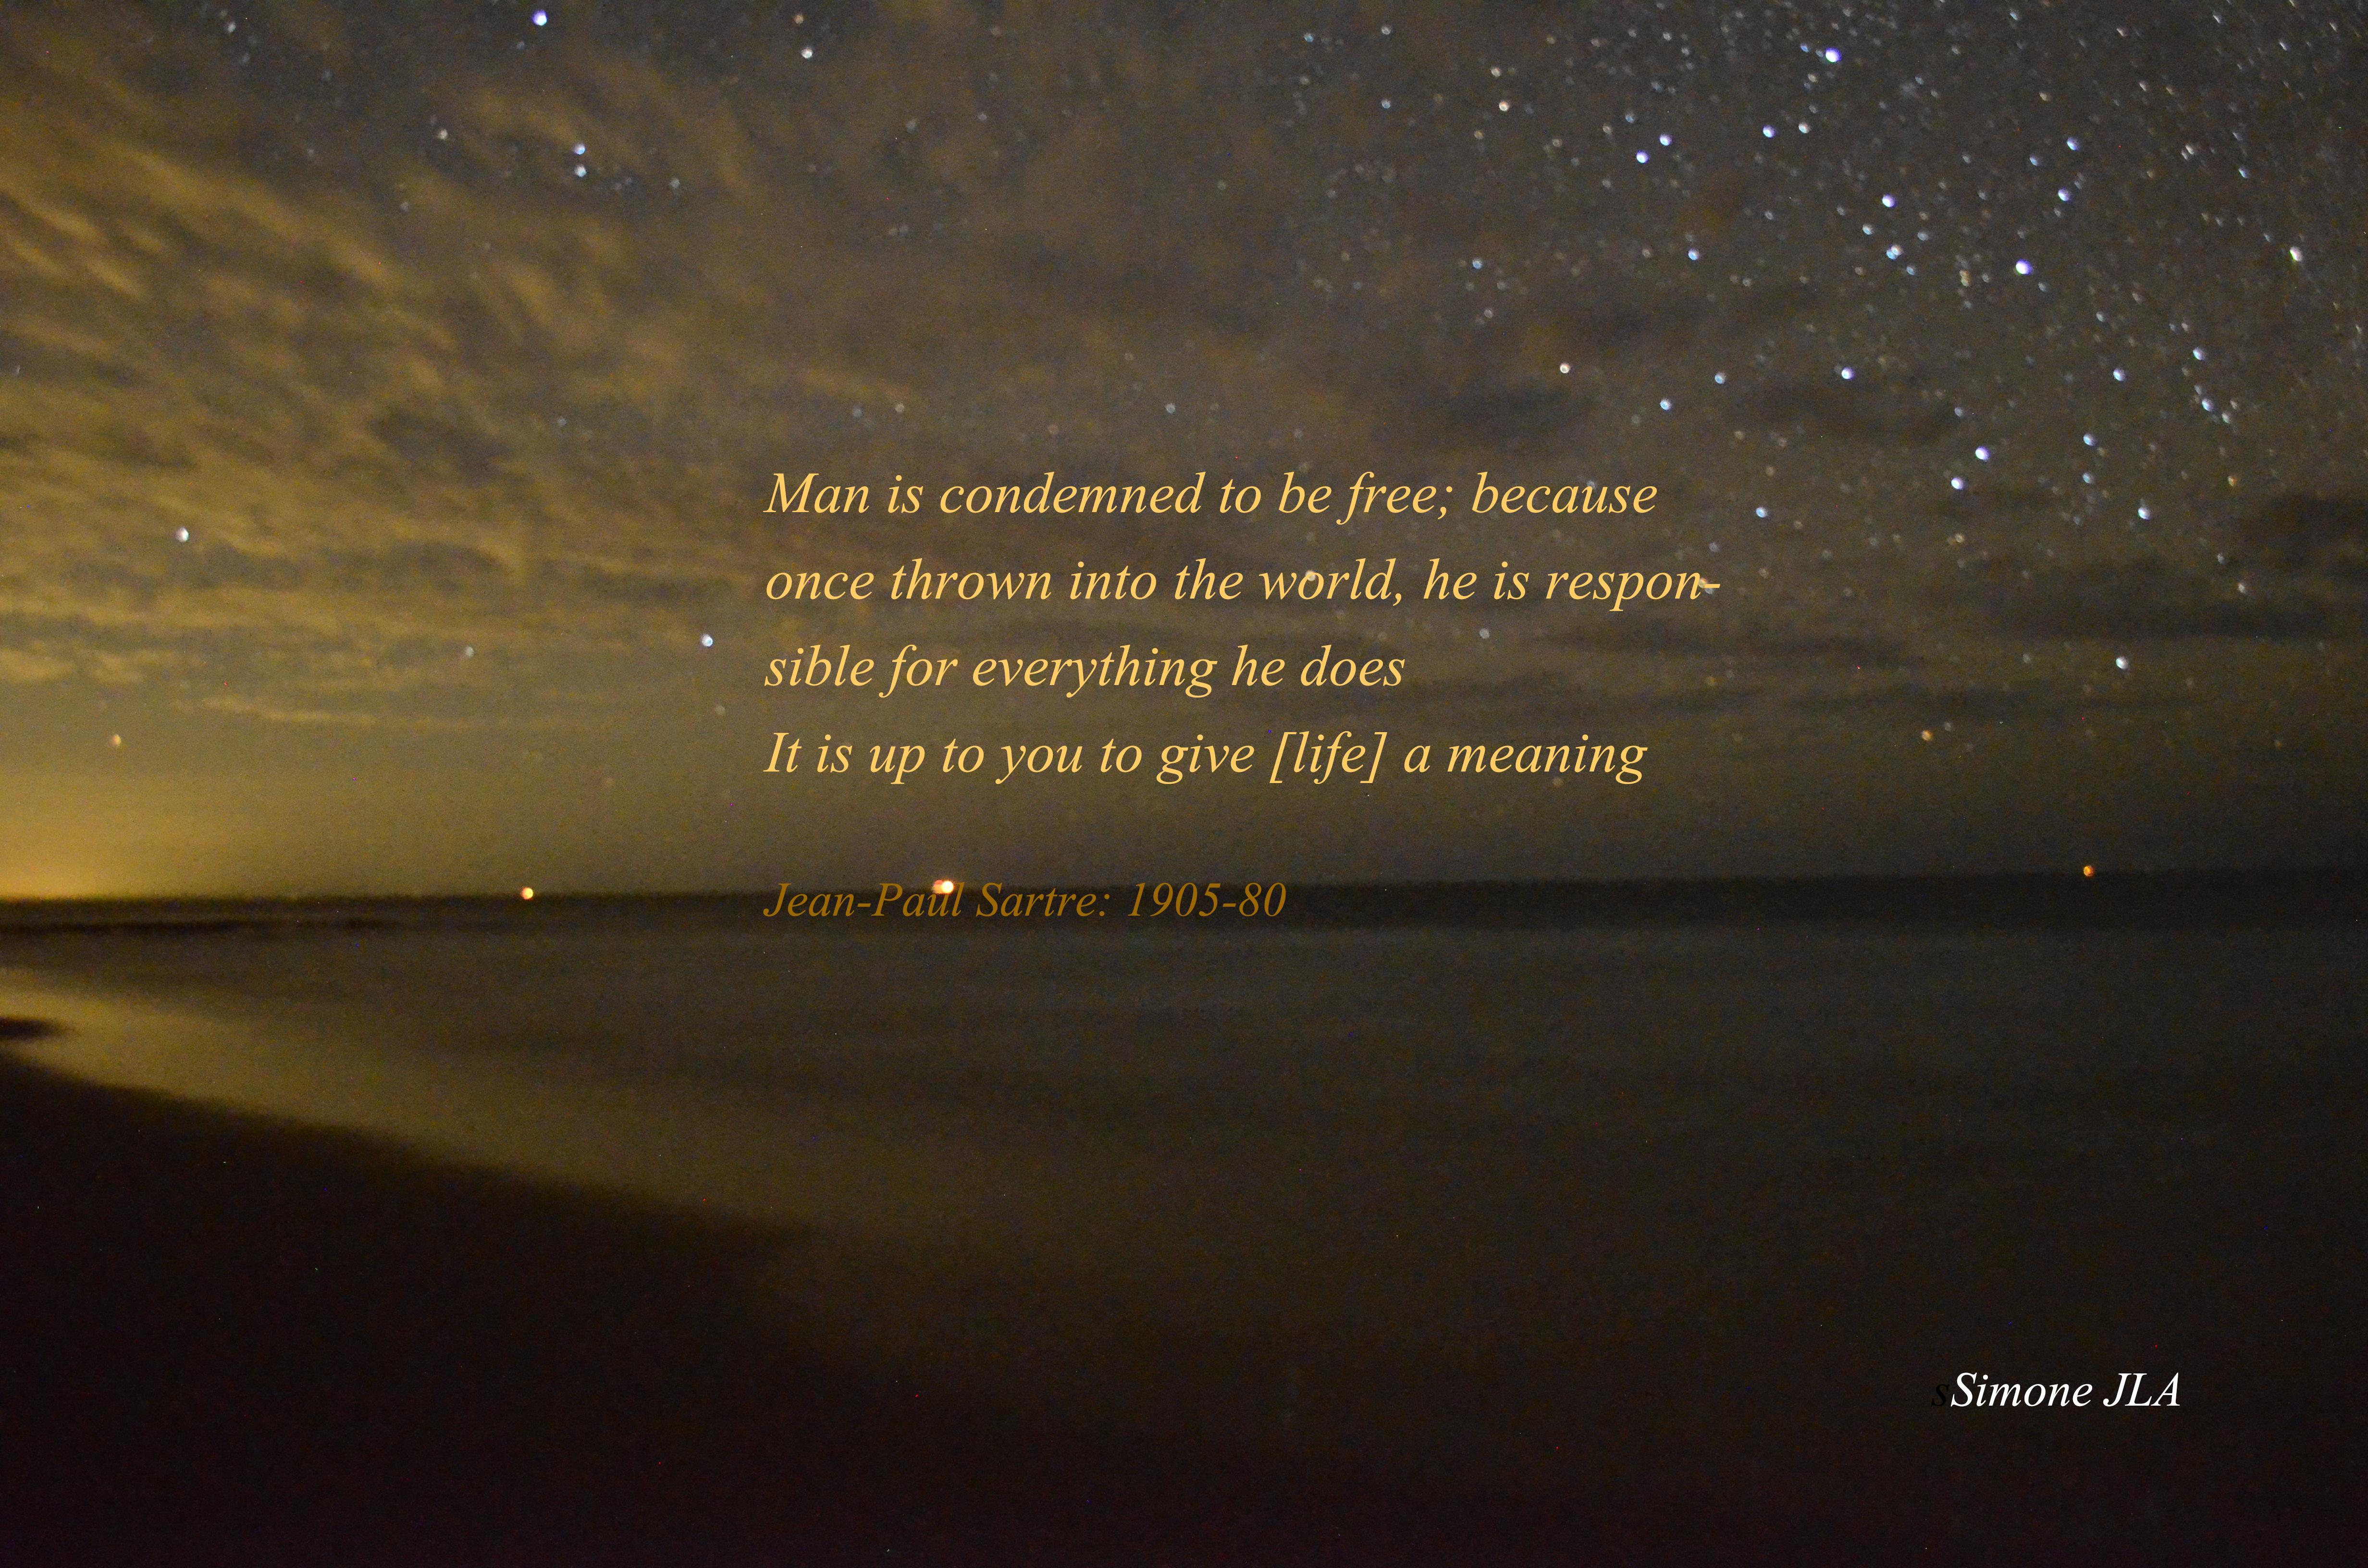 Jean-Paul Sartre's quote #2